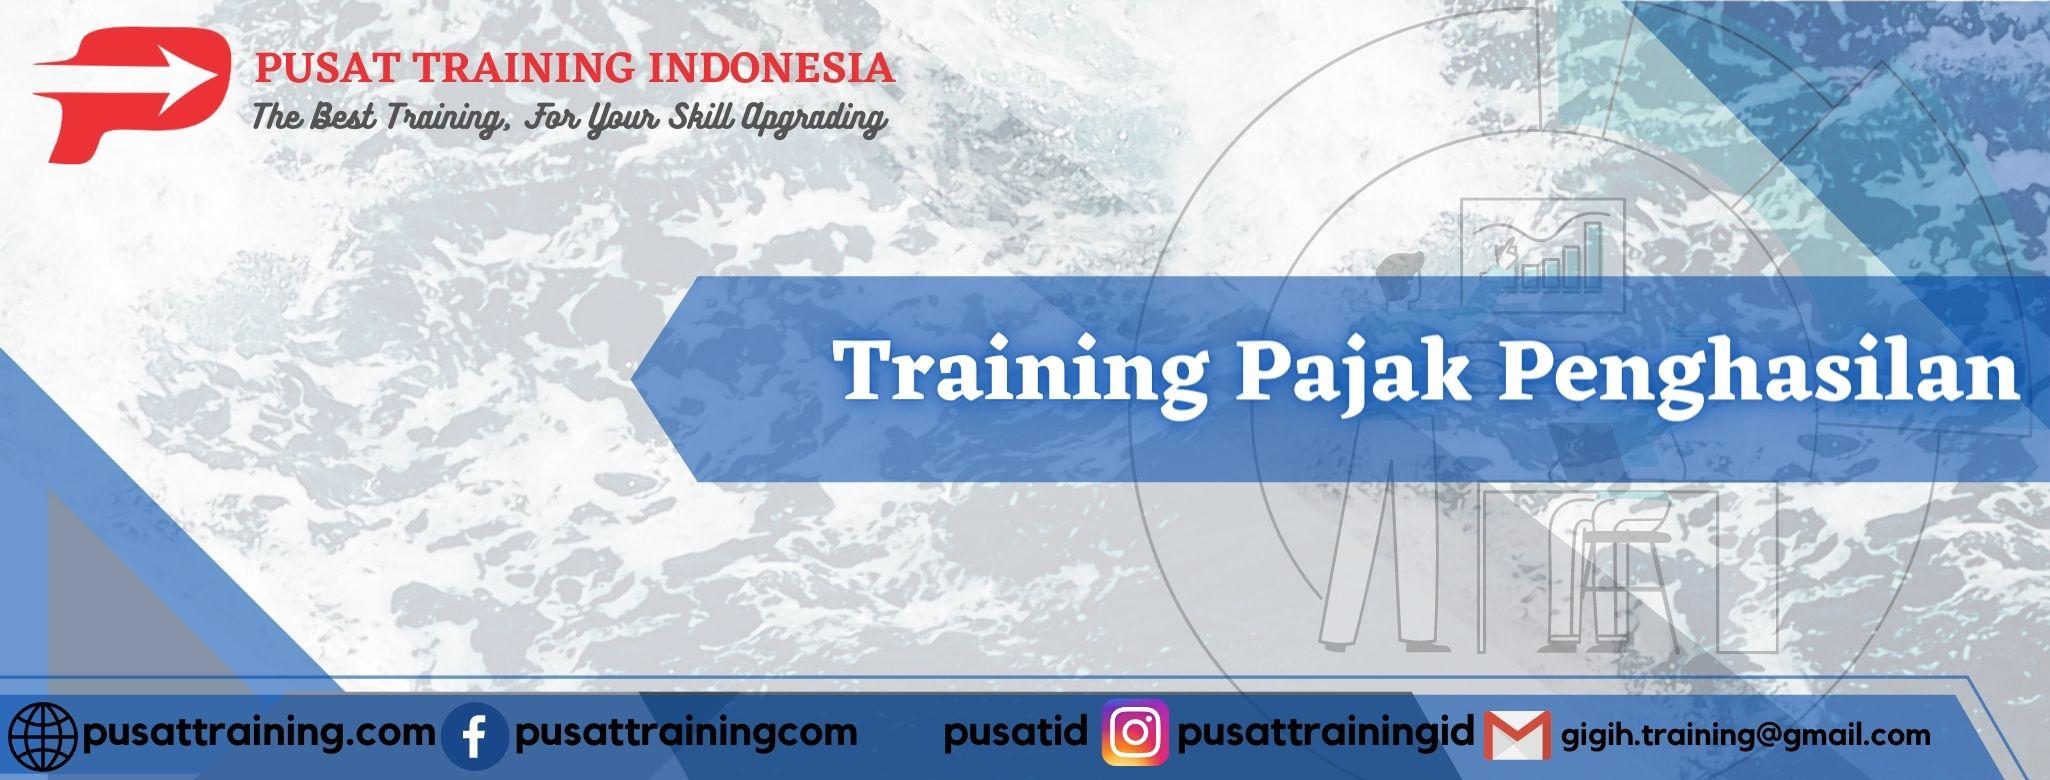 Training-Pajak-Penghasilan